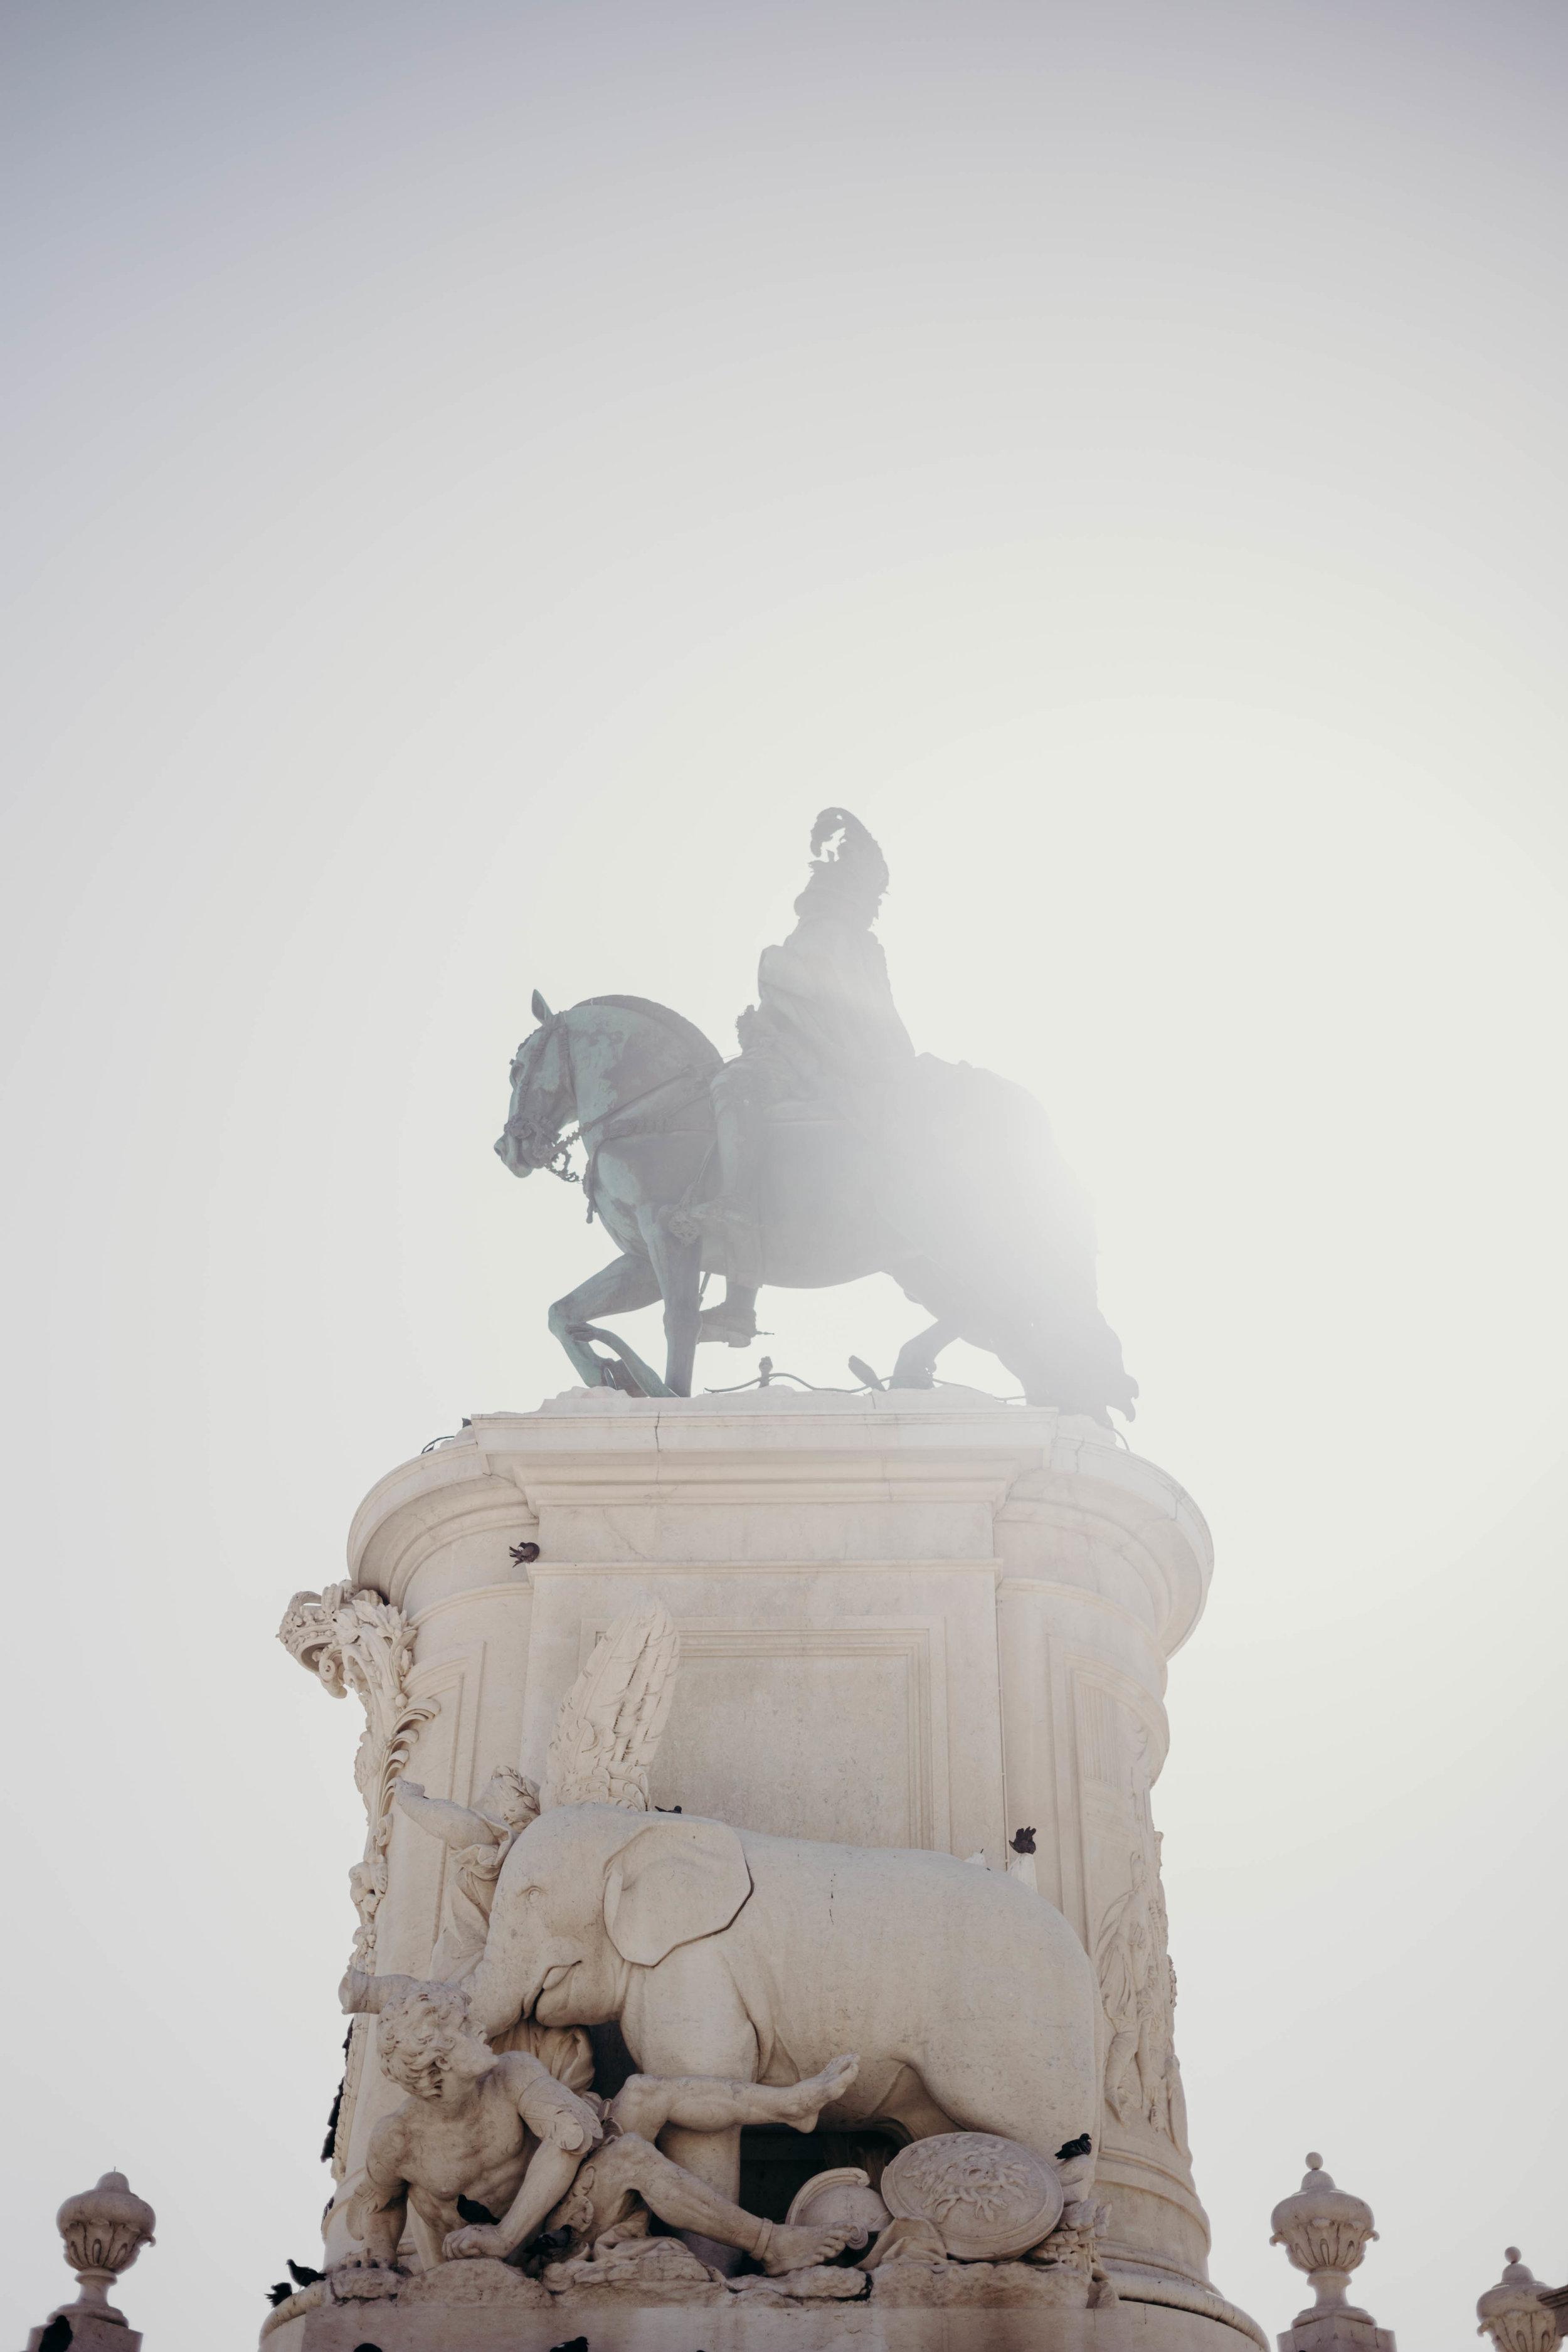 Our Portugal Travel Diary: Lisbon, Porto, and More | On the Street Where We Live (aretherelilactrees.com)  Praca do Comercio